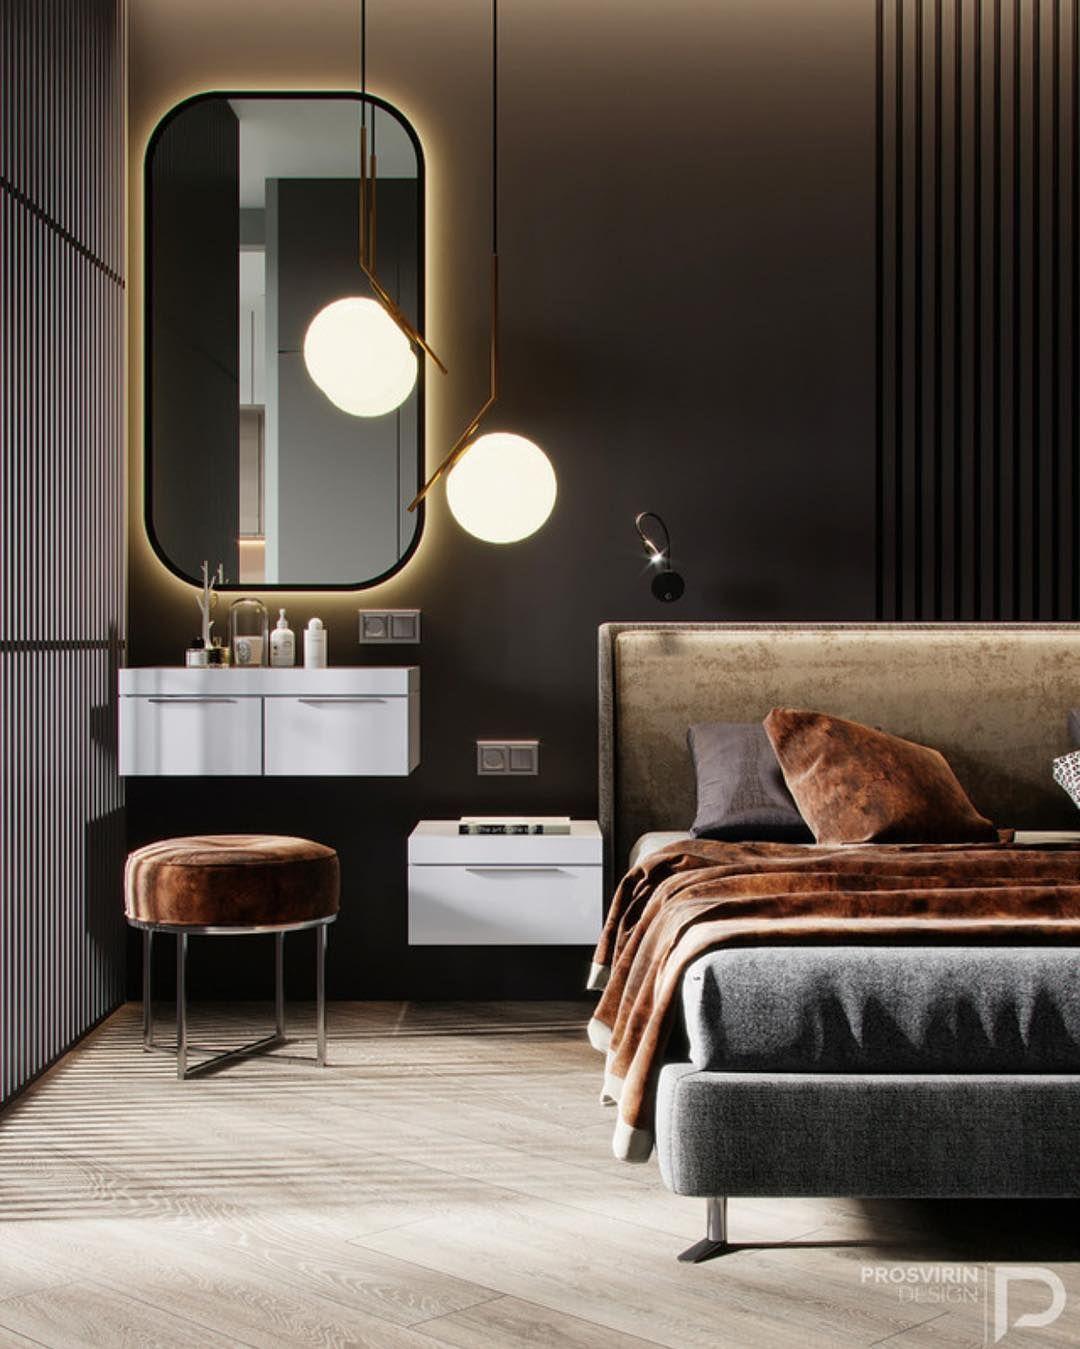 Essential Home Mid Century Furniture Luxurious Bedrooms Home Decor Bedroom Luxury Bedroom Decor